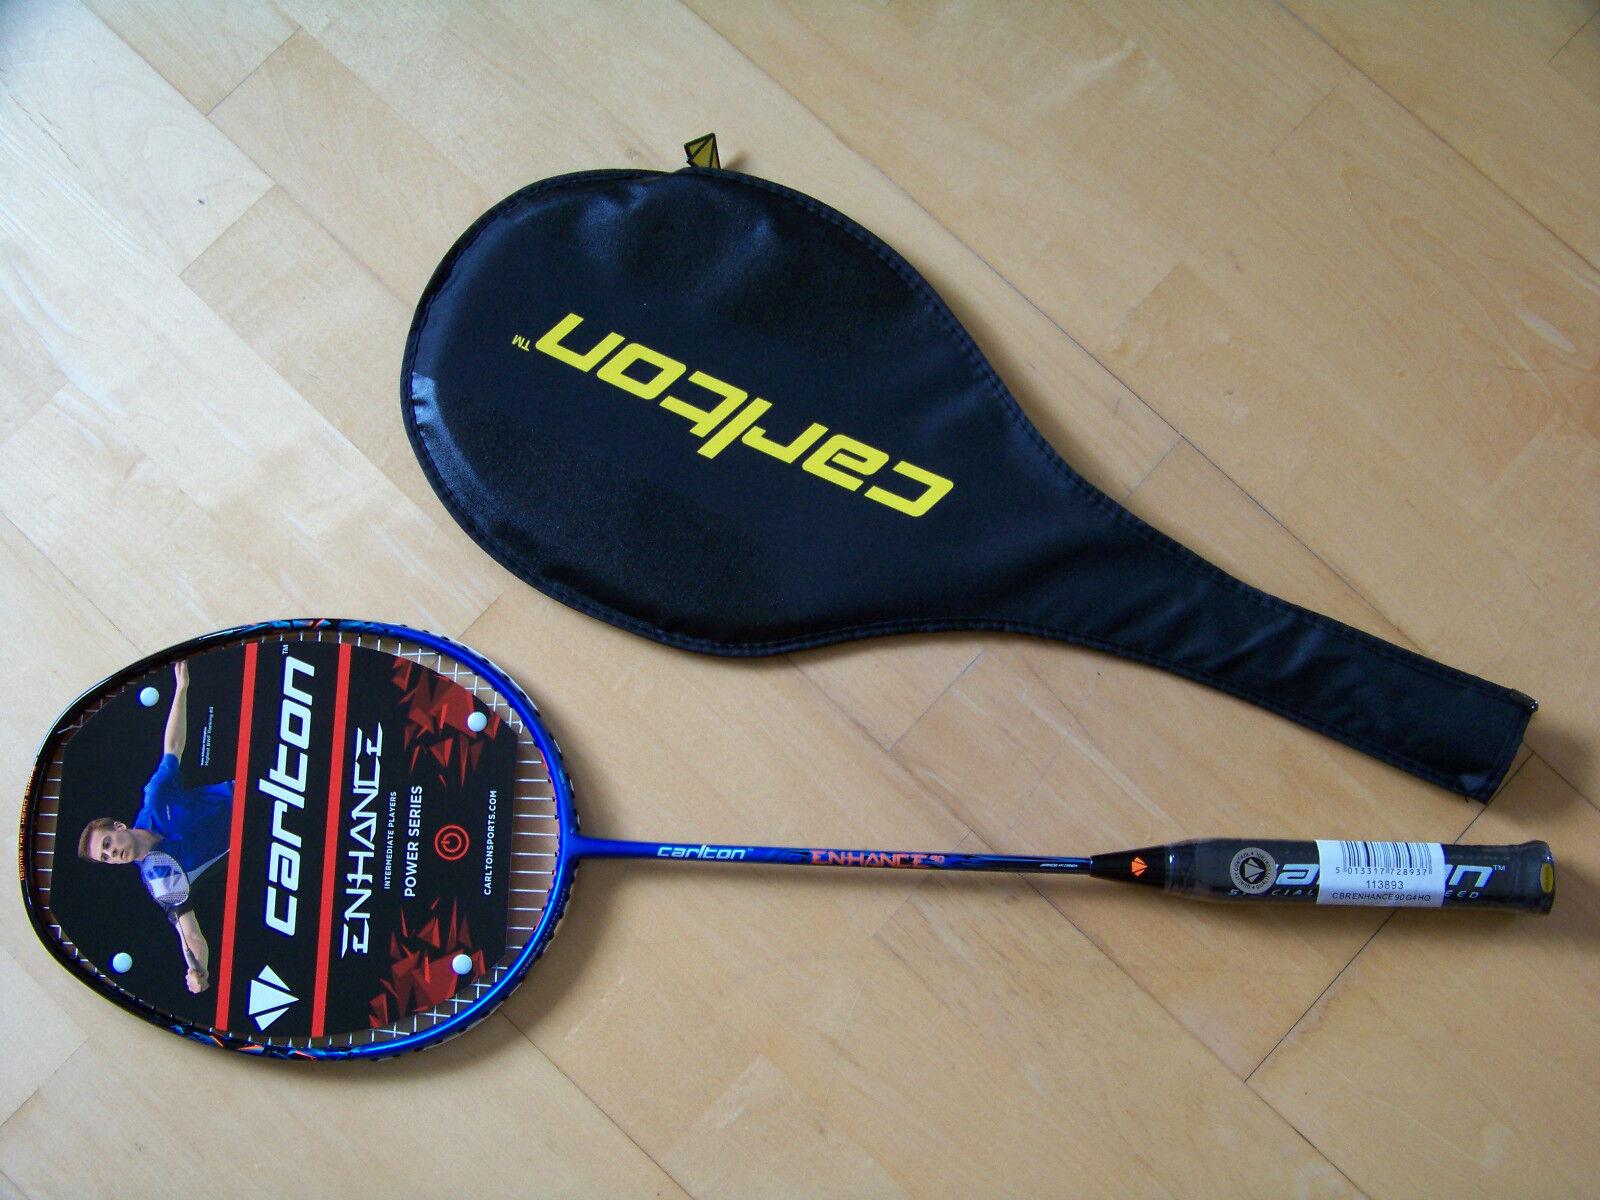 Badmintonschläger Carlton Enhance 90, NEU, NEU, 90, 422069